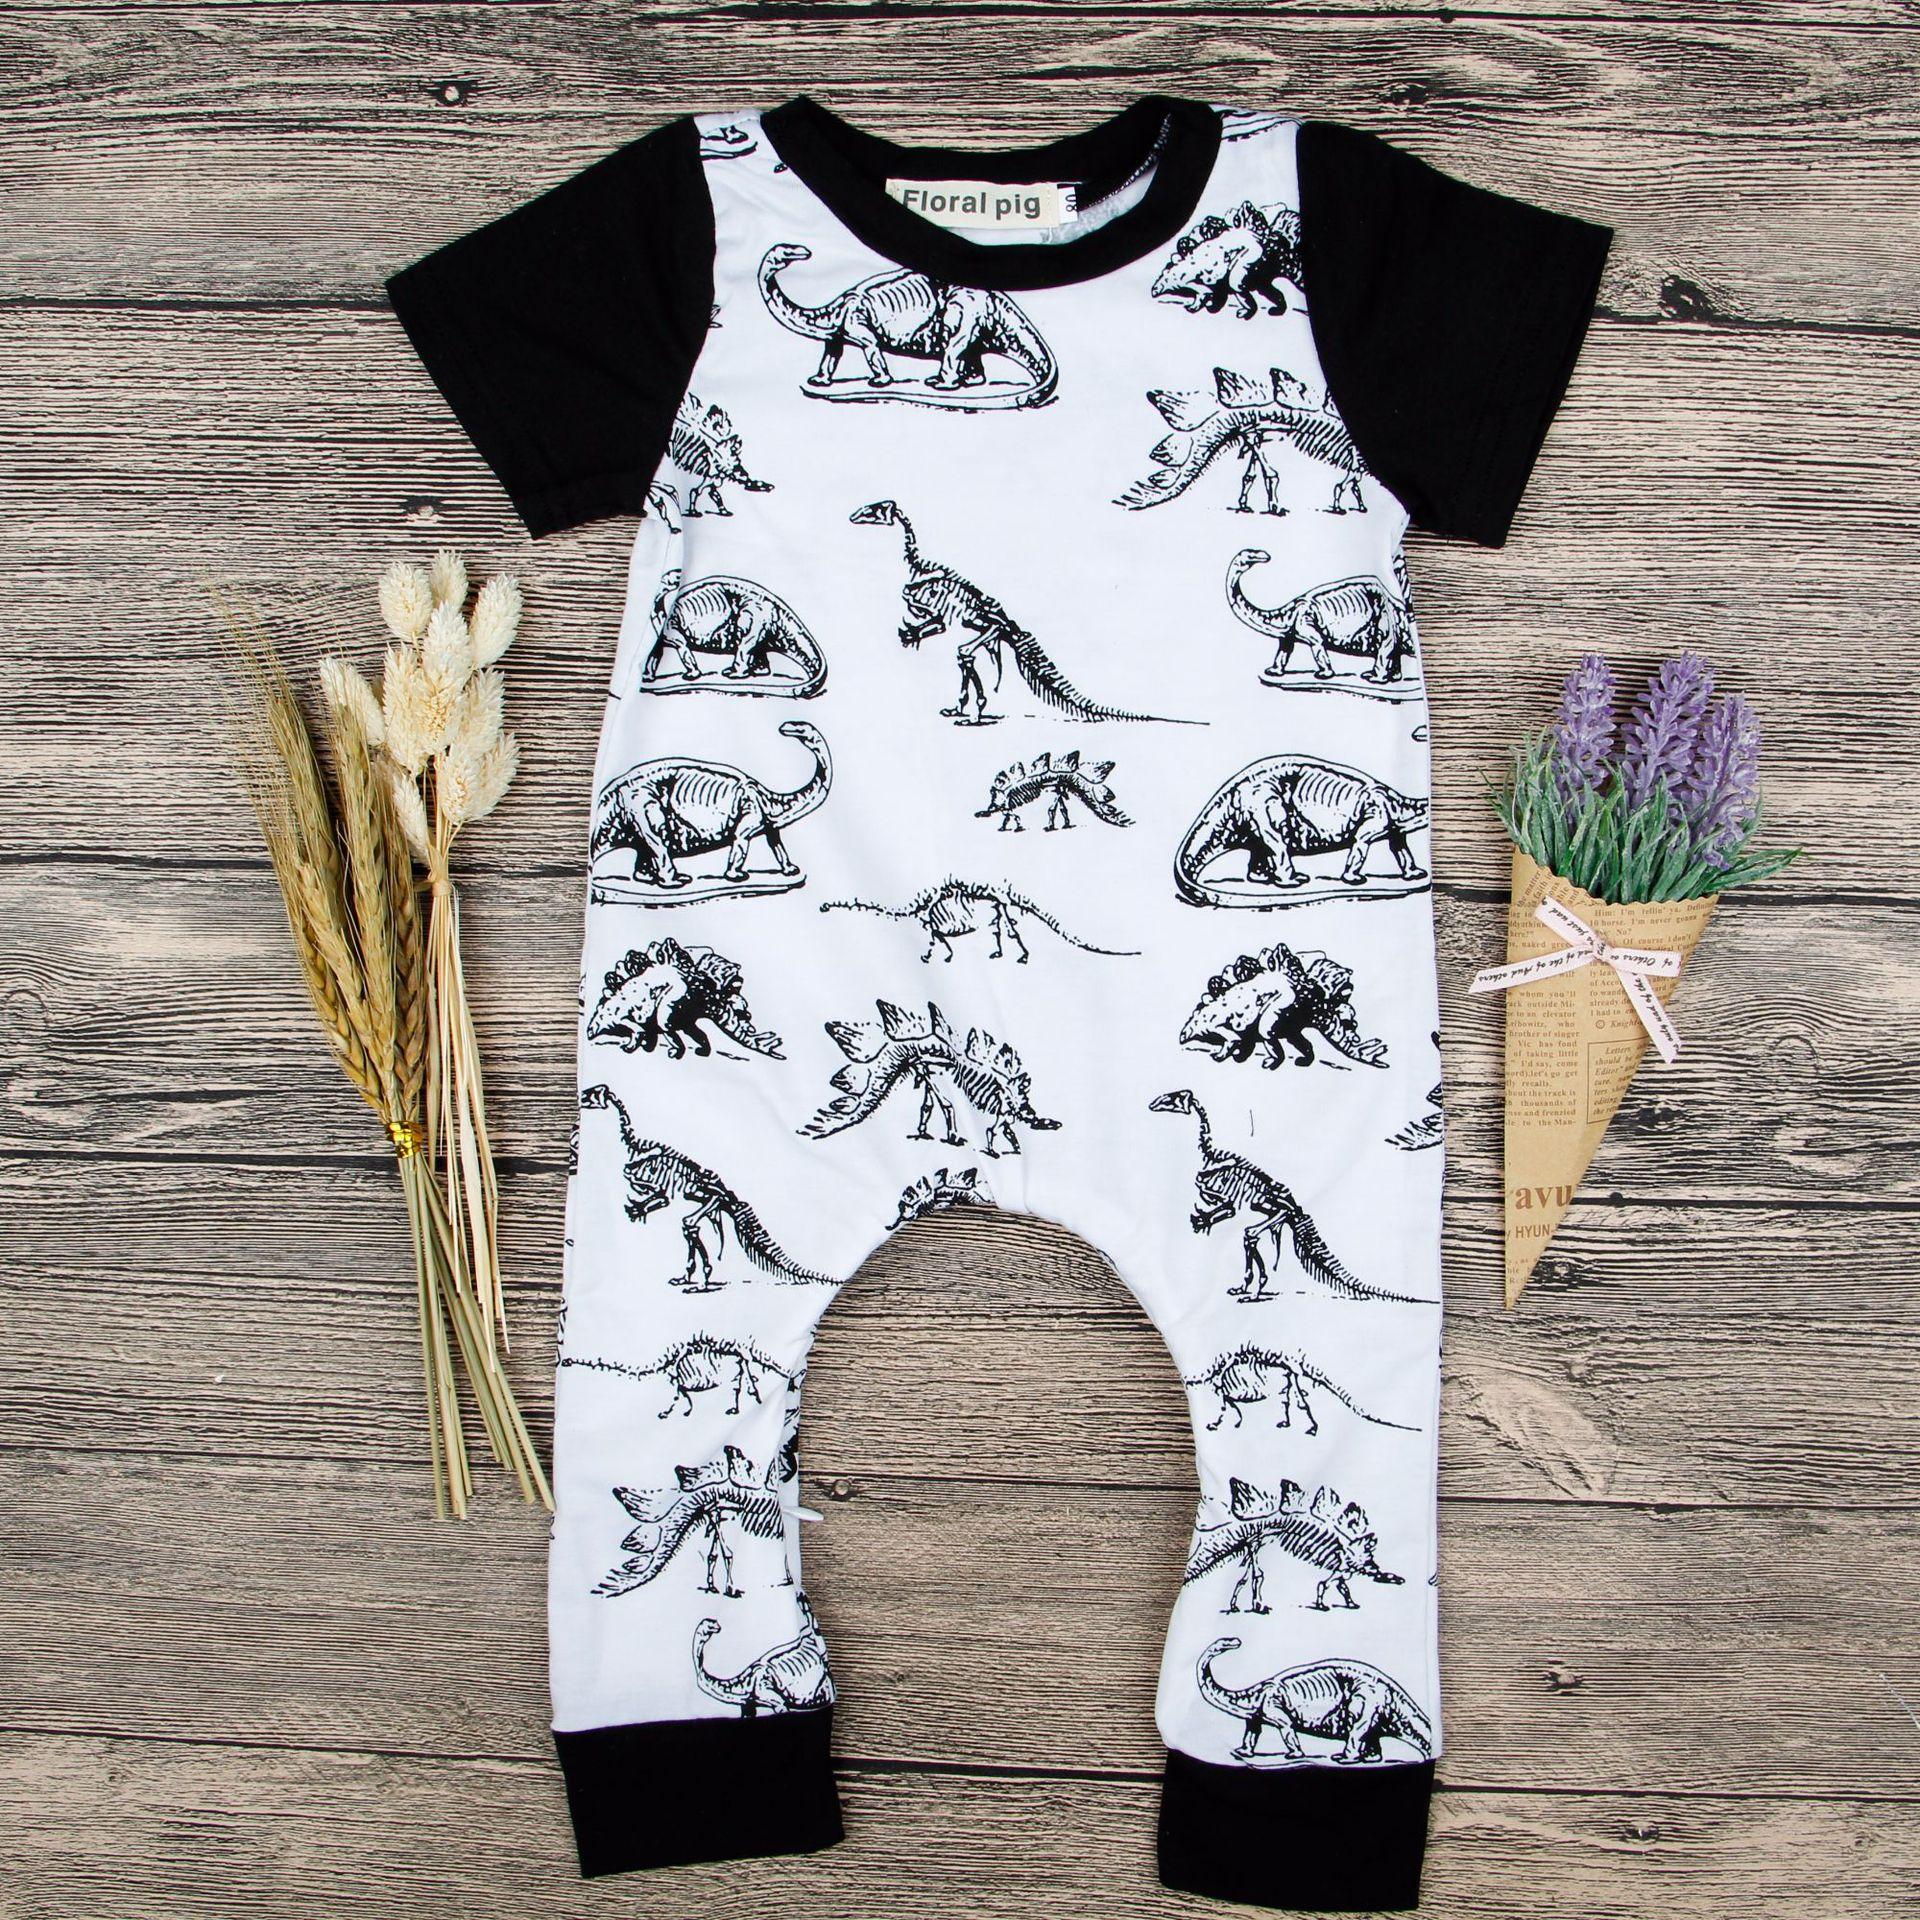 670ed23918e0 2018 Newborn Baby Dinosaur Clothes Infant Baby Girls Sleeveless ...